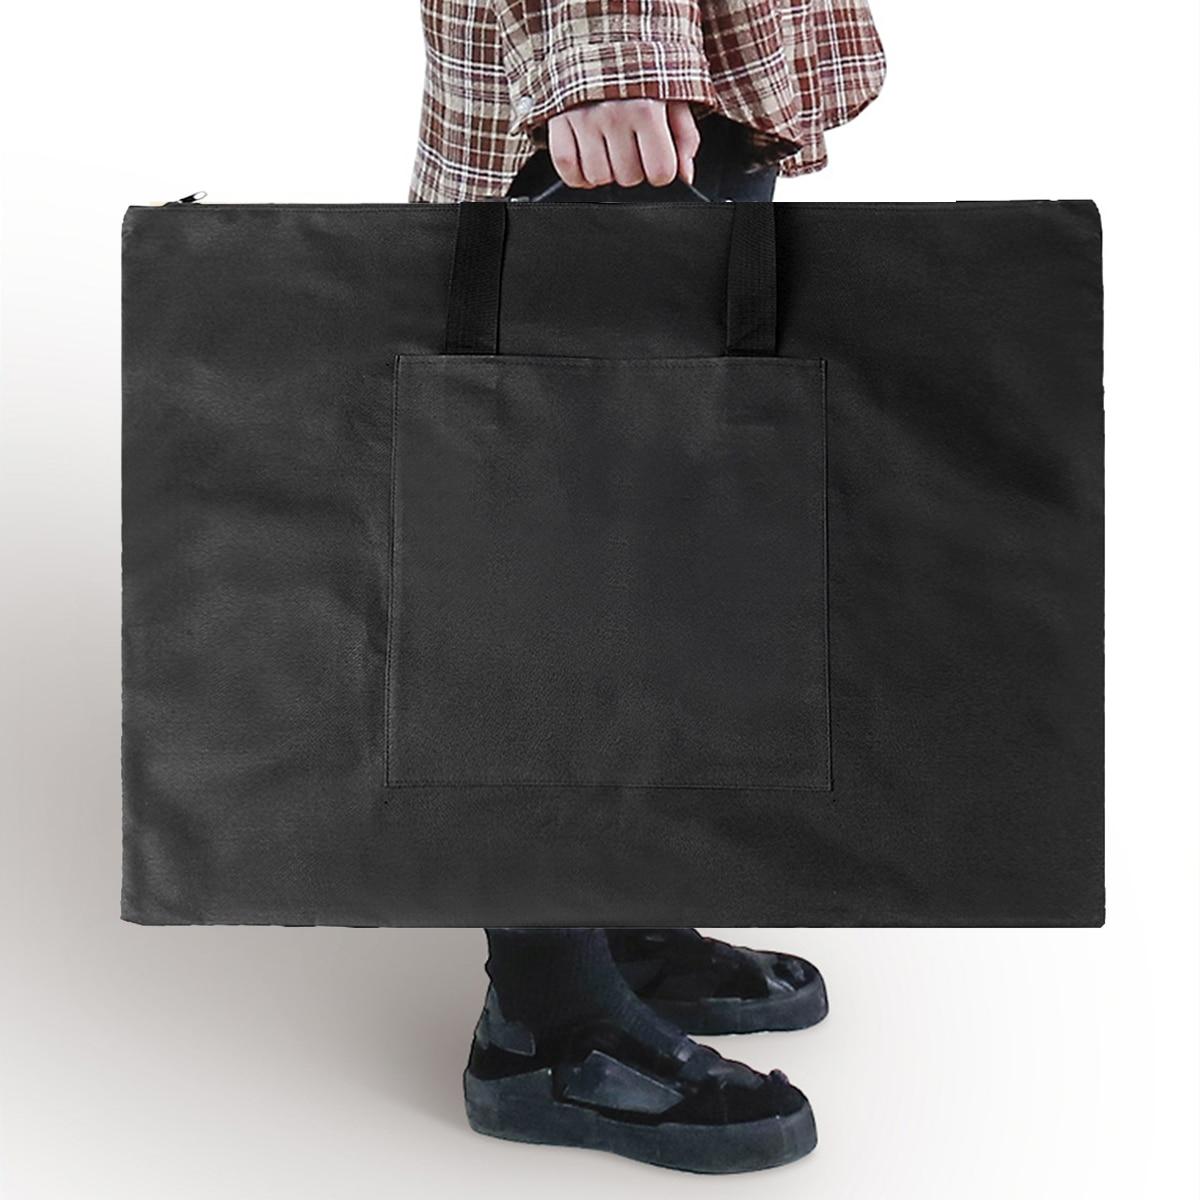 Drawing Board Bag Document Handbag A2 Drawing Painting Board Storage File Bags Adjustable Strap Shoulder Bag Free Shipping